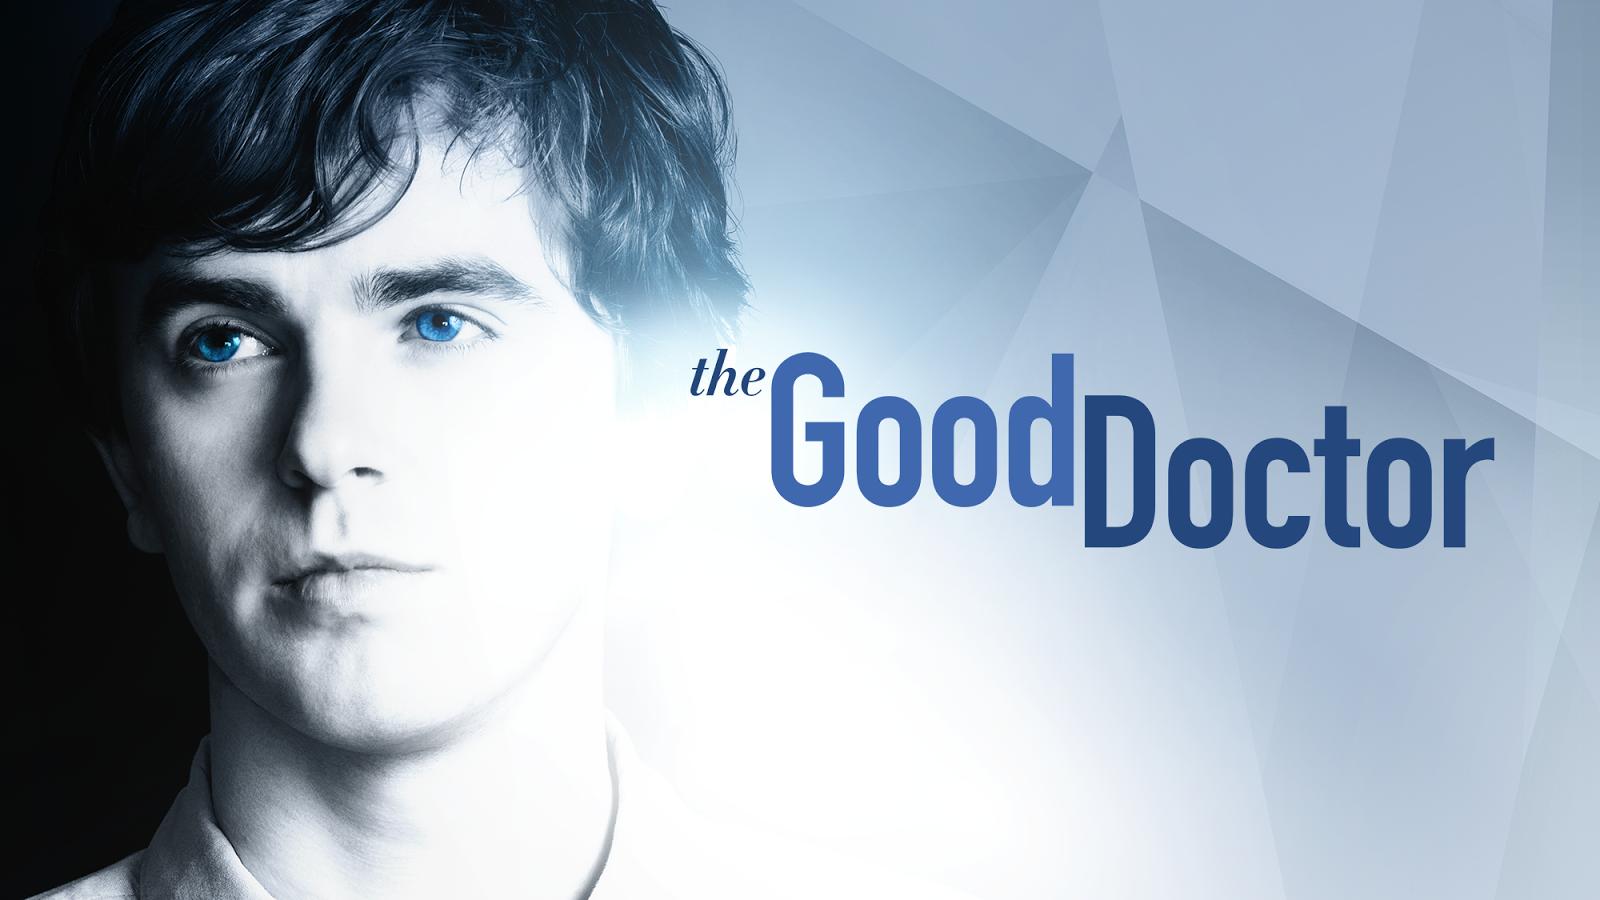 The Good Doktor